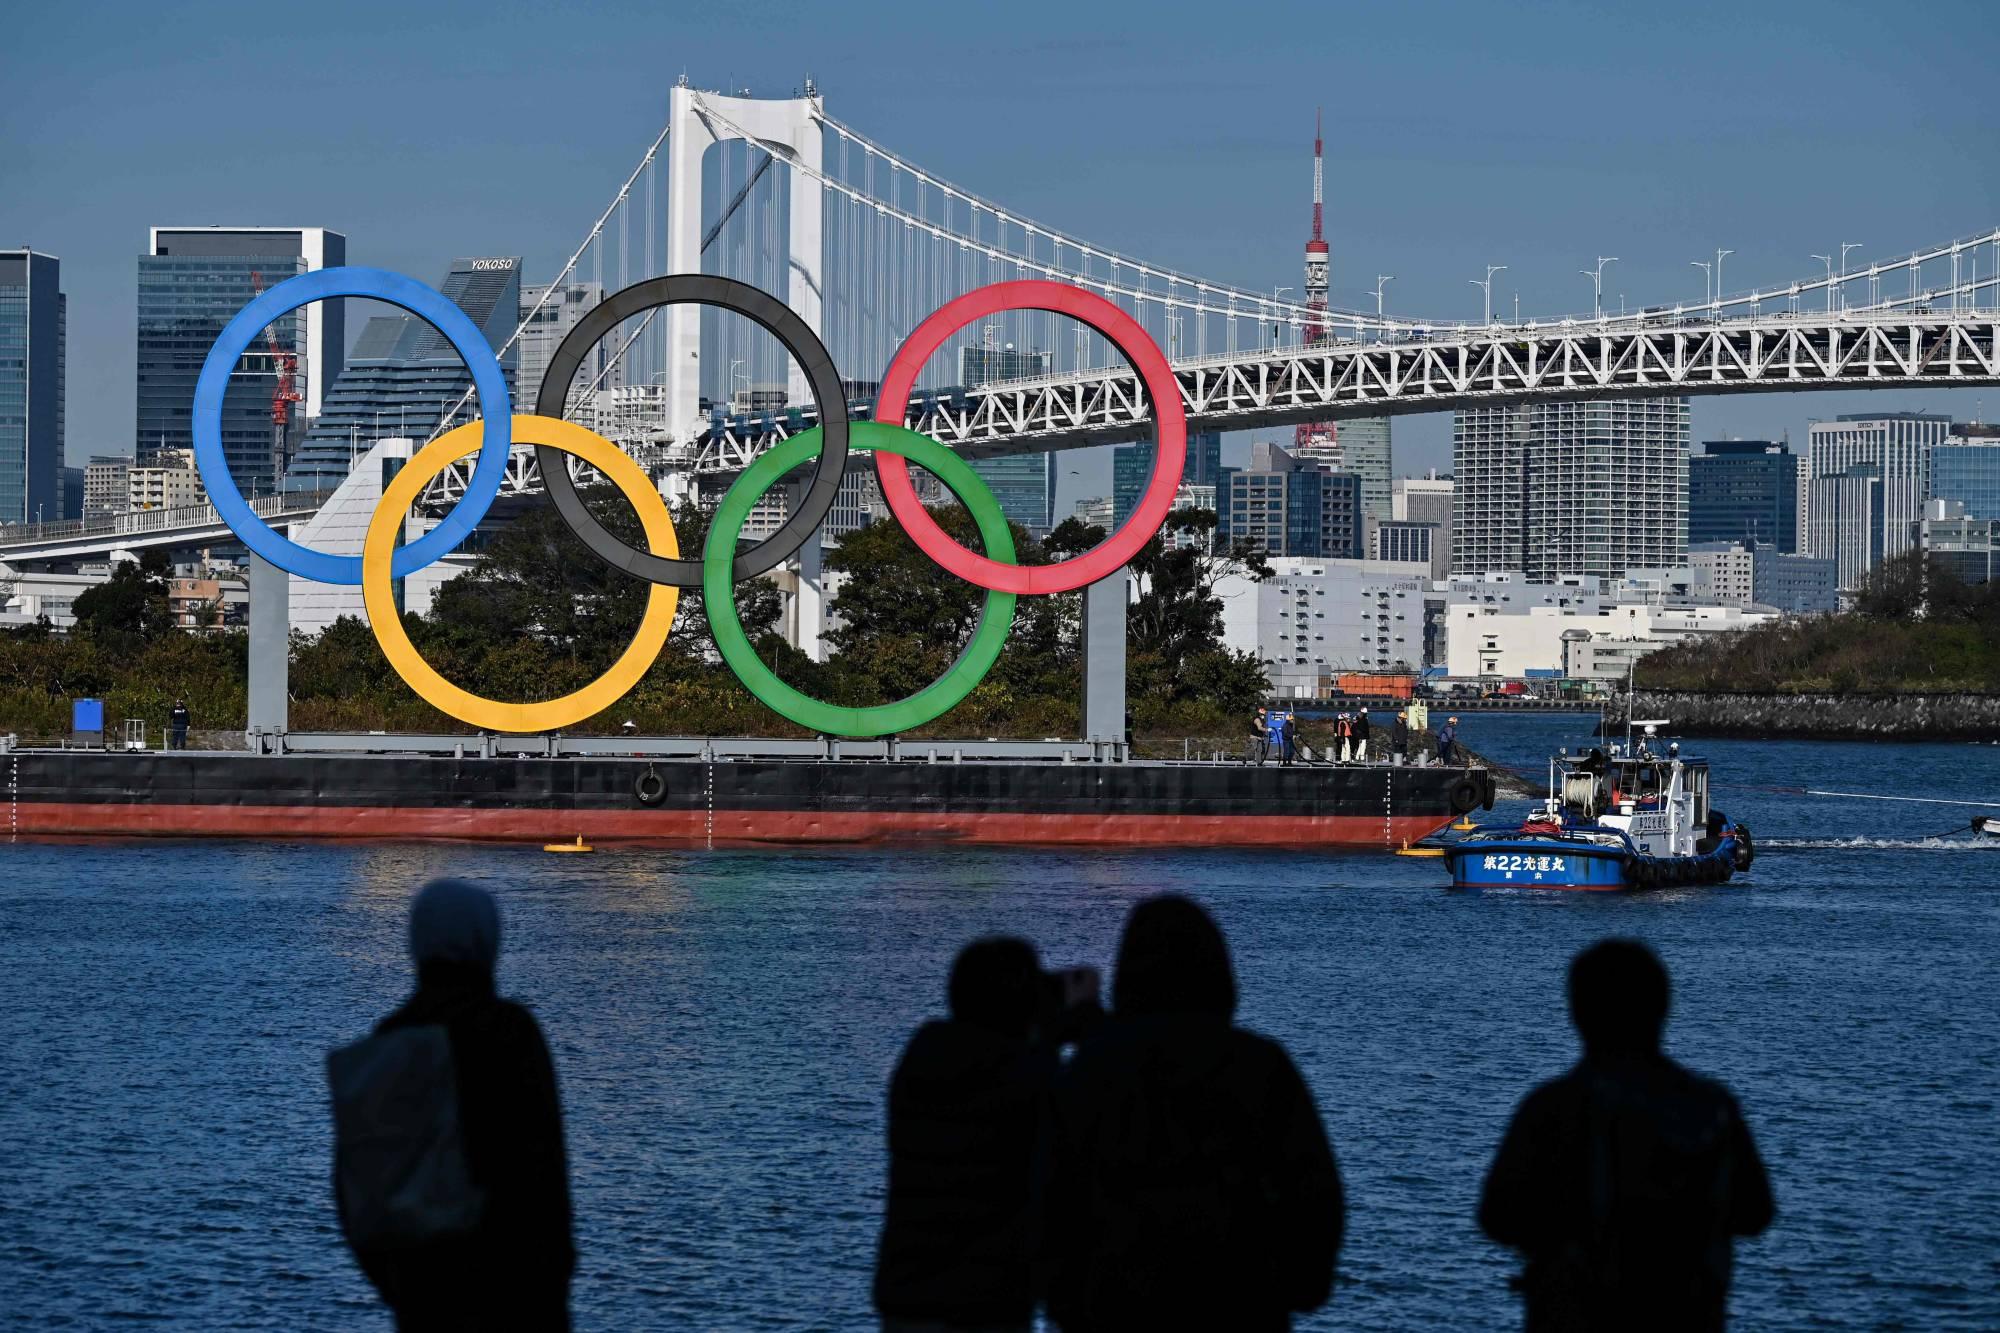 Jepang masih bertekad menjadi tuan rumah Olimpiade pada musim panas 2021. Foto: AFP